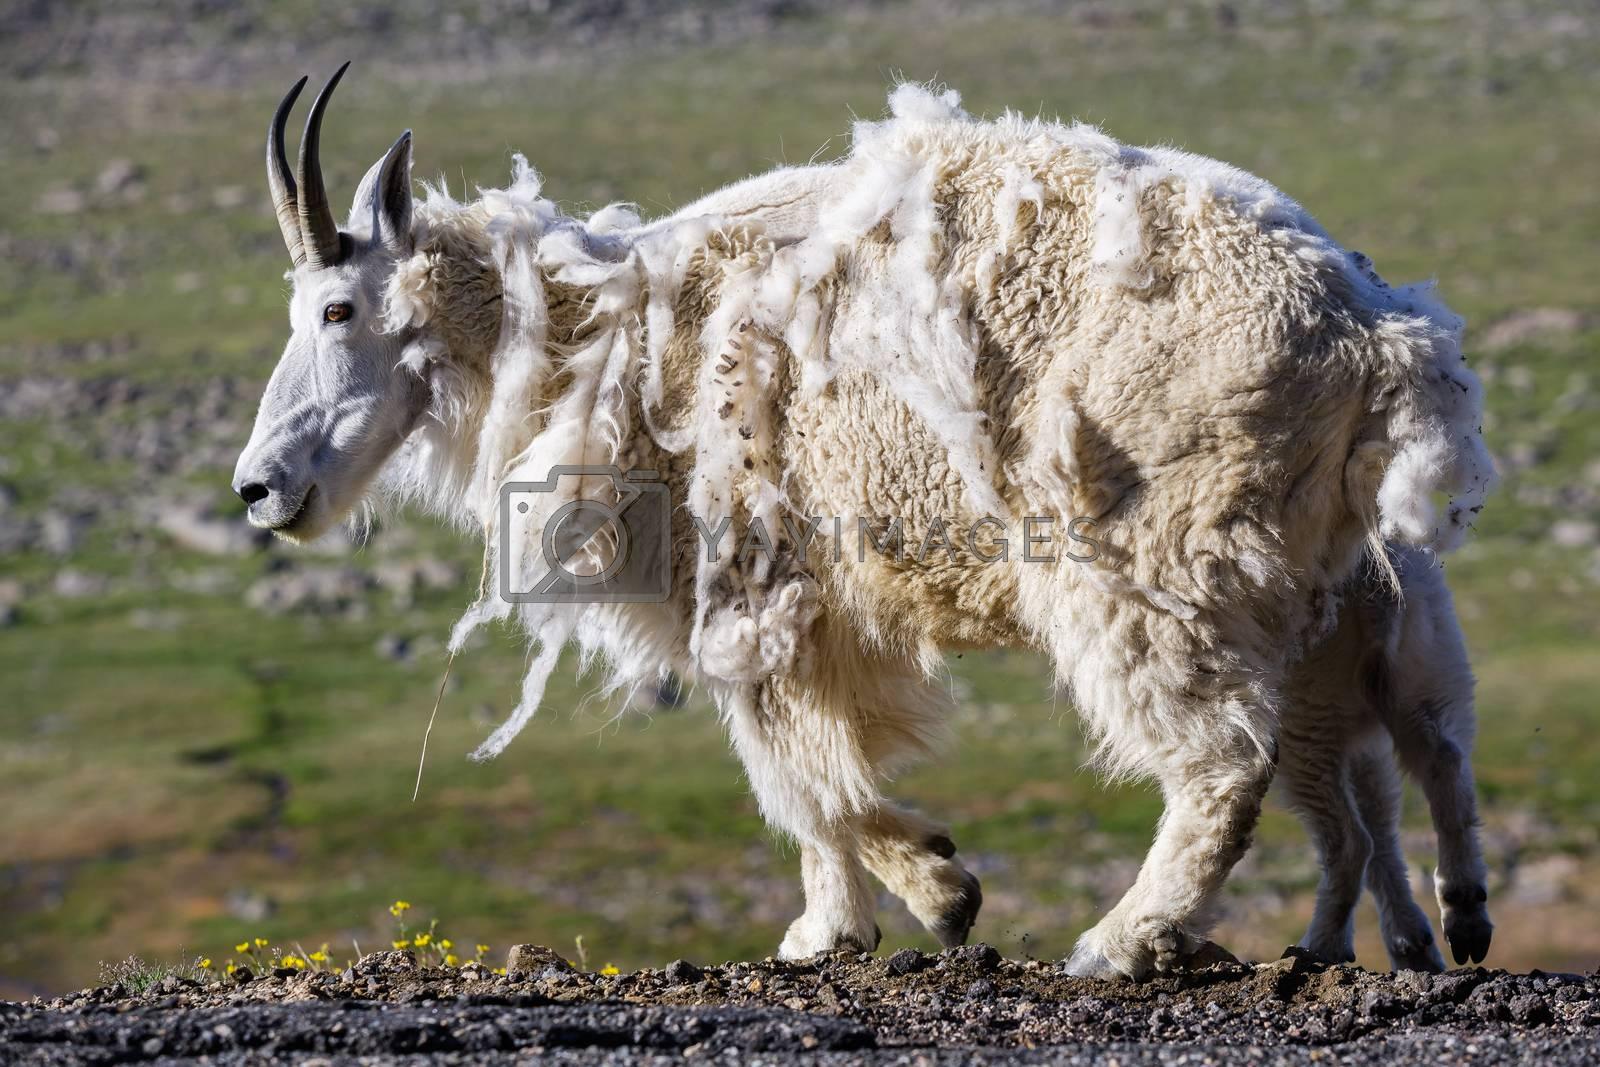 Wild Mountain Goats of the Colorado Rocky Mountains by Gary Gray